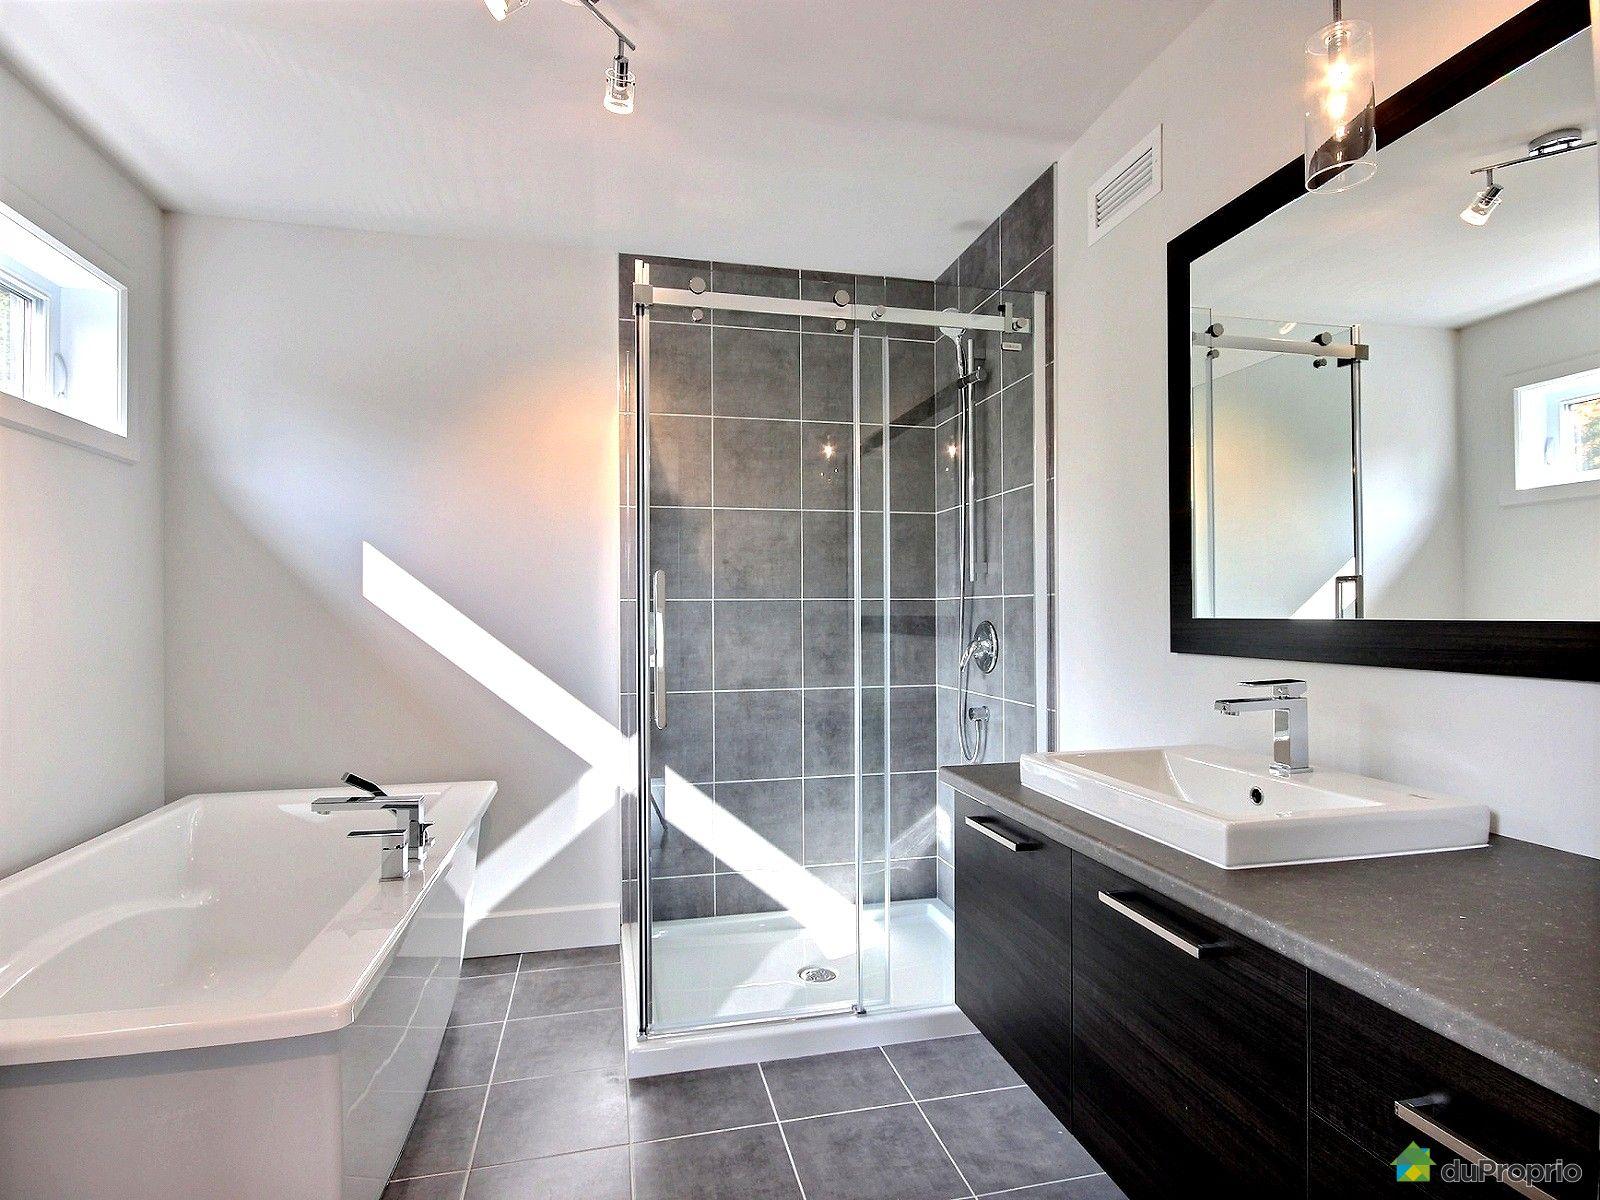 Jumel neuf vendu fleurimont immobilier qu bec for Salle de bain komodo